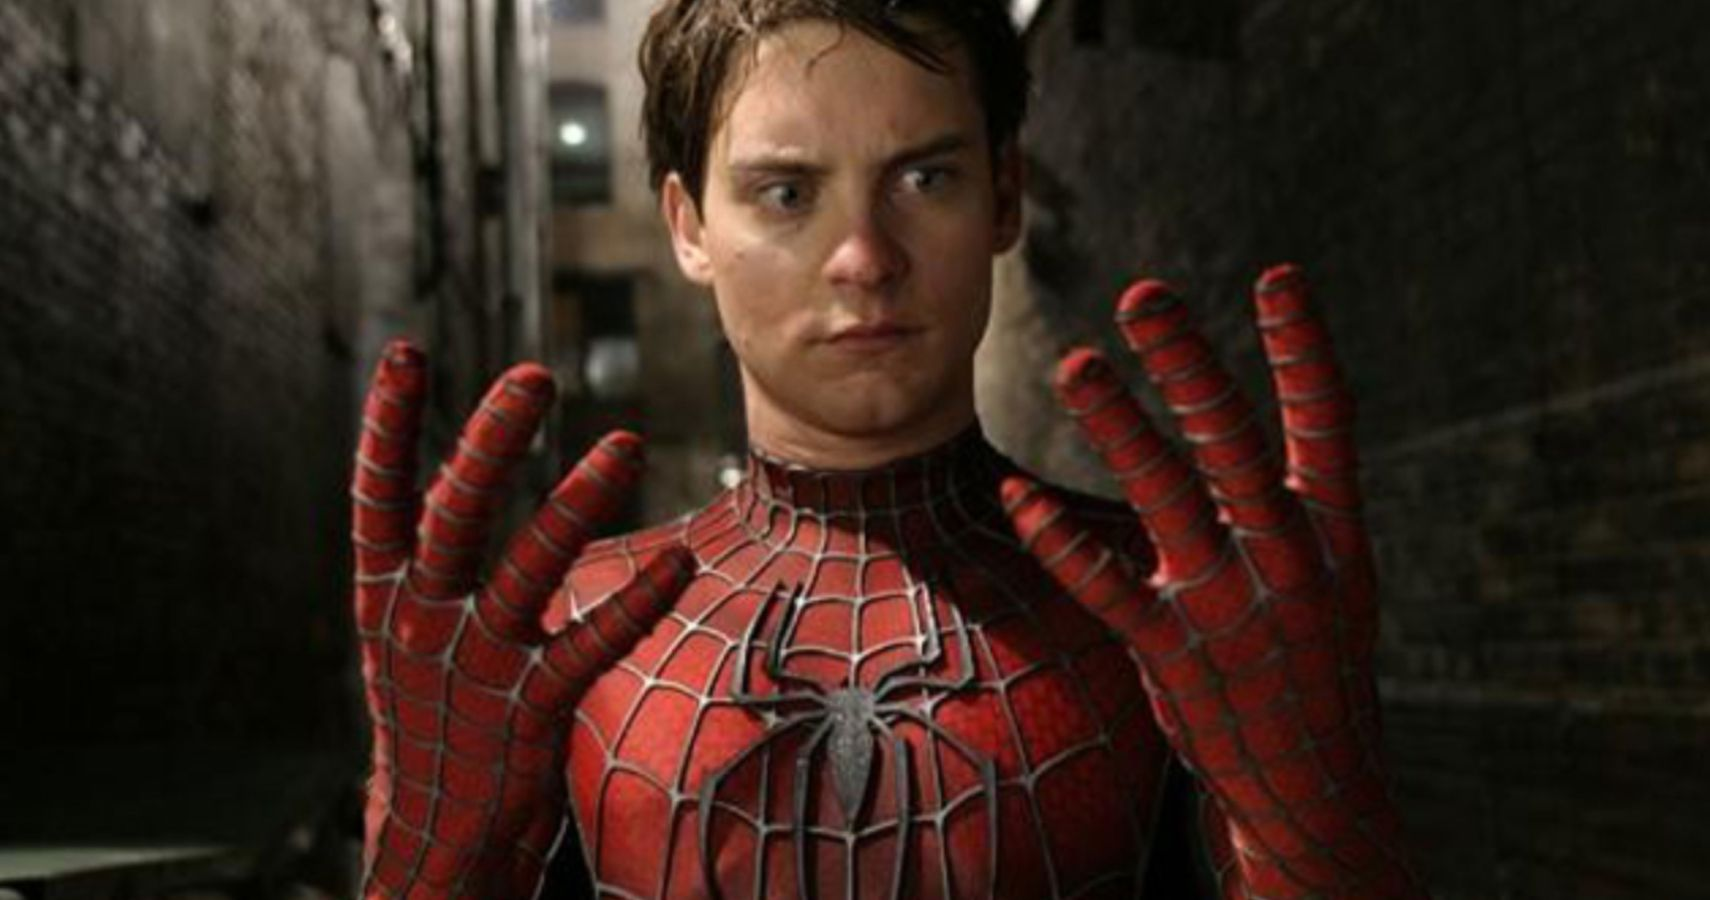 Alvin Sargent, Spider-Man Trilogy Writer, Dead at 92